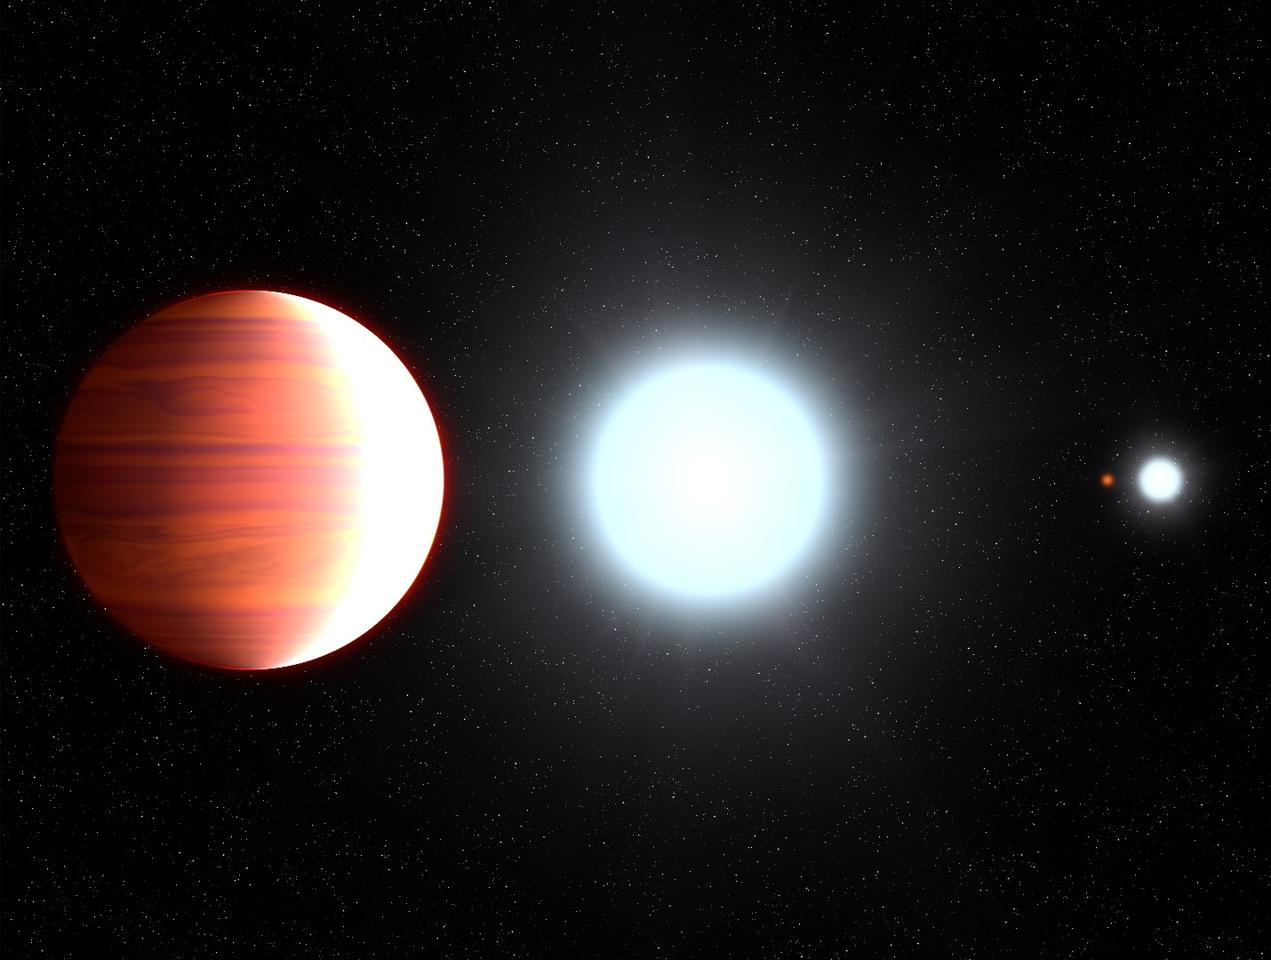 Artist's impression of Kepler-13Ab orbiting its parent star, Kepler-13A – the planet orbits in a multiple star system